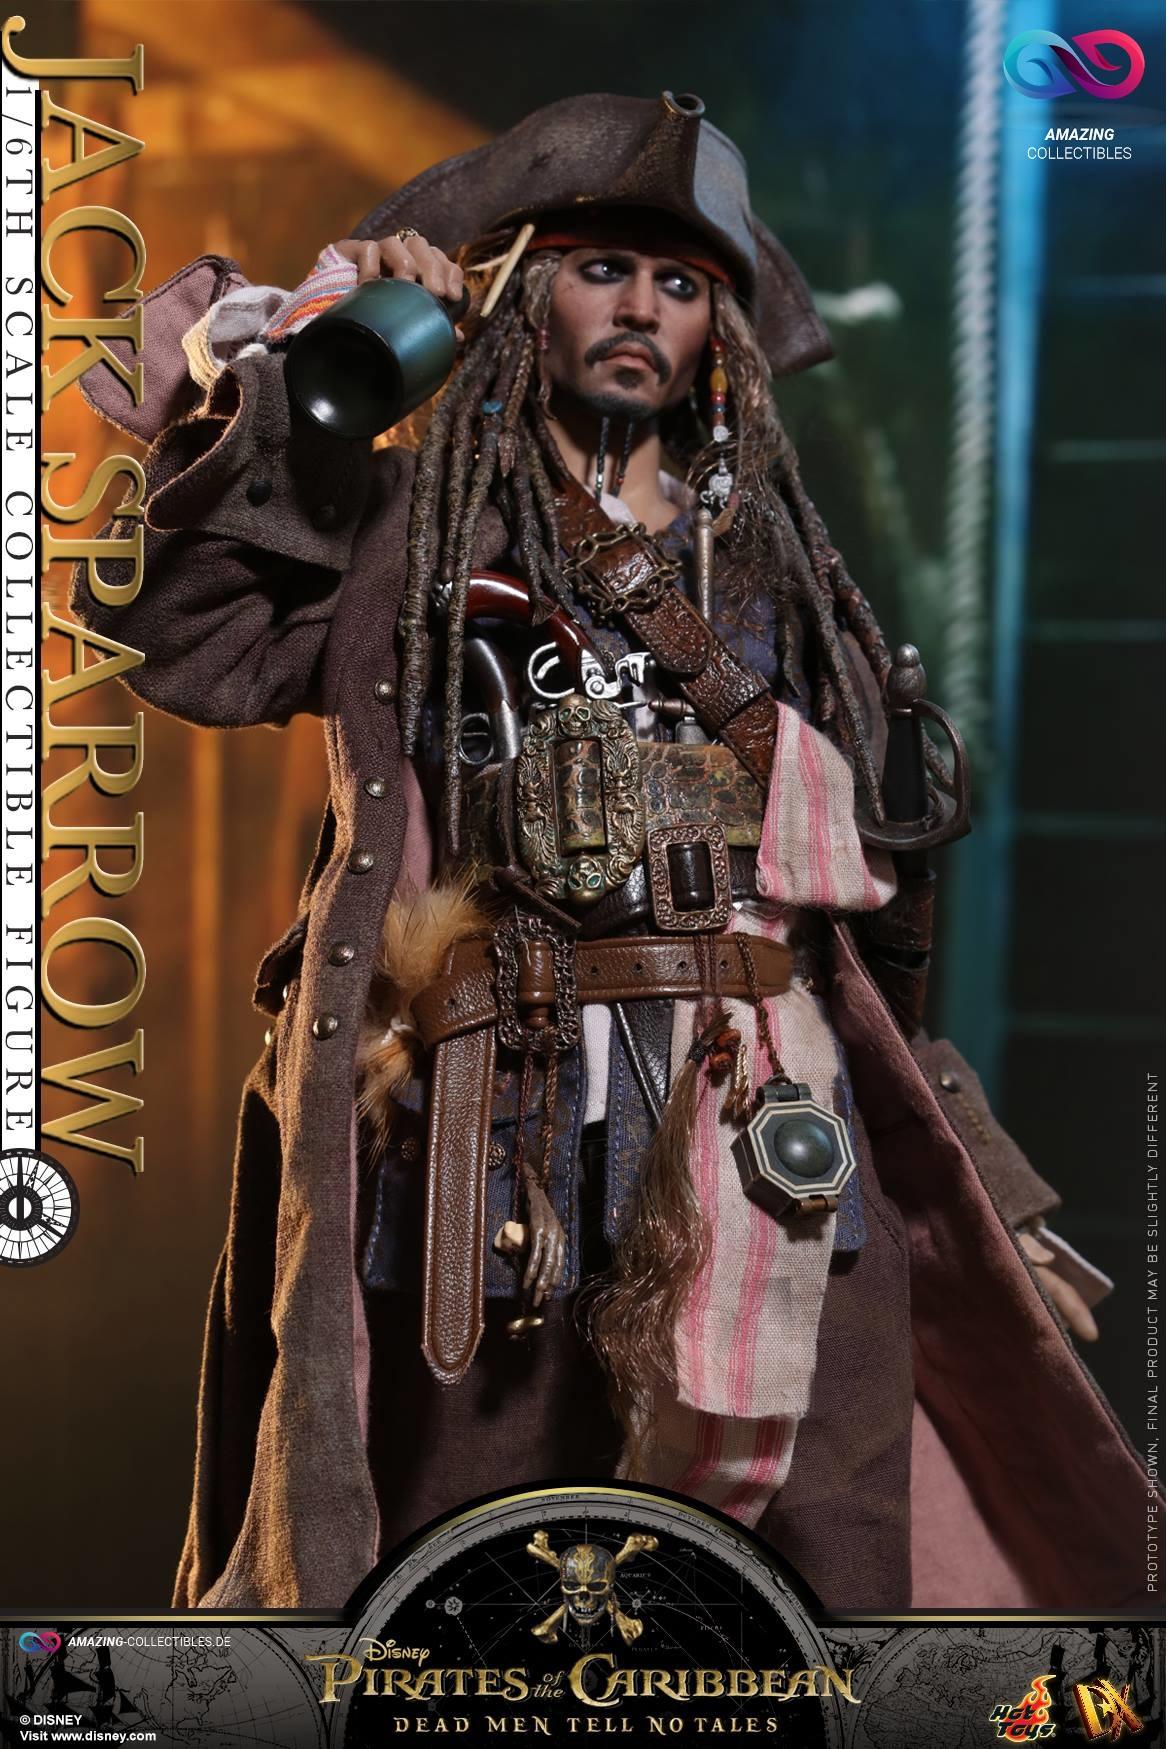 Hot Toys Captain Jack Sparrow Pirates of the Caribbean Dead